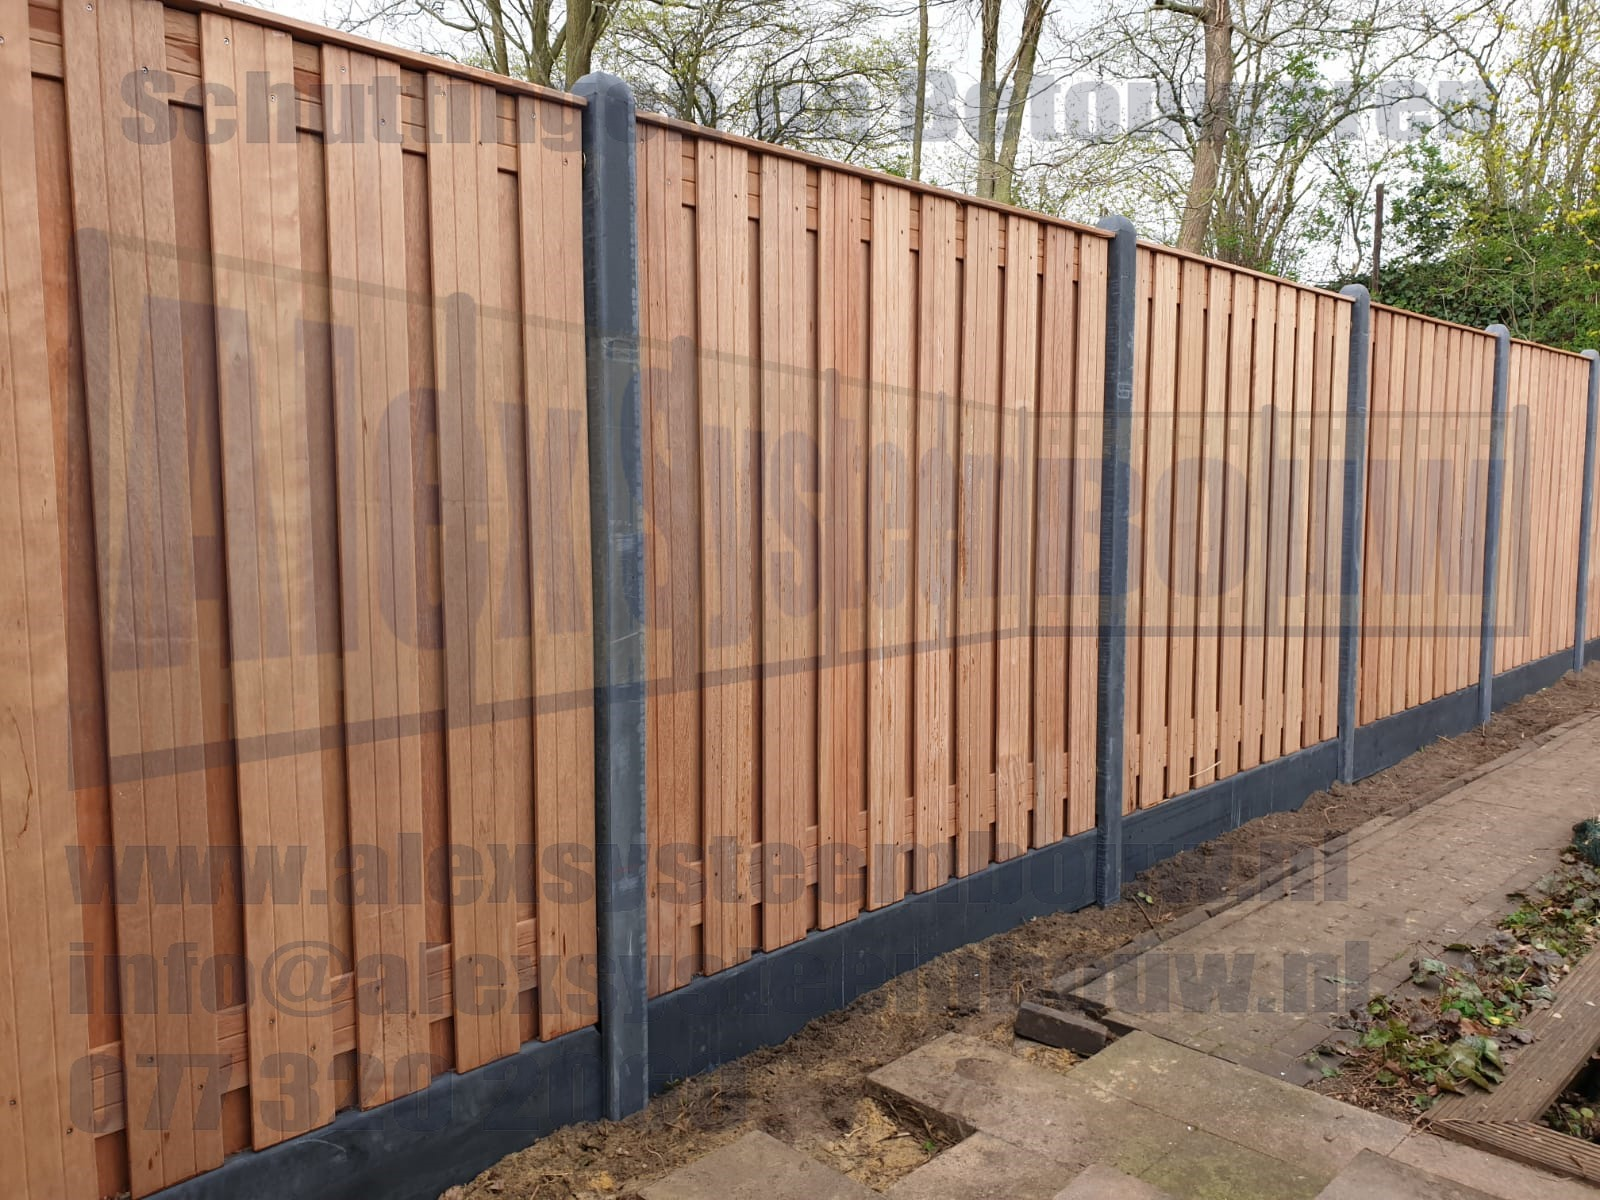 hard-houten-tuinschermen-21-planks-kegelkop